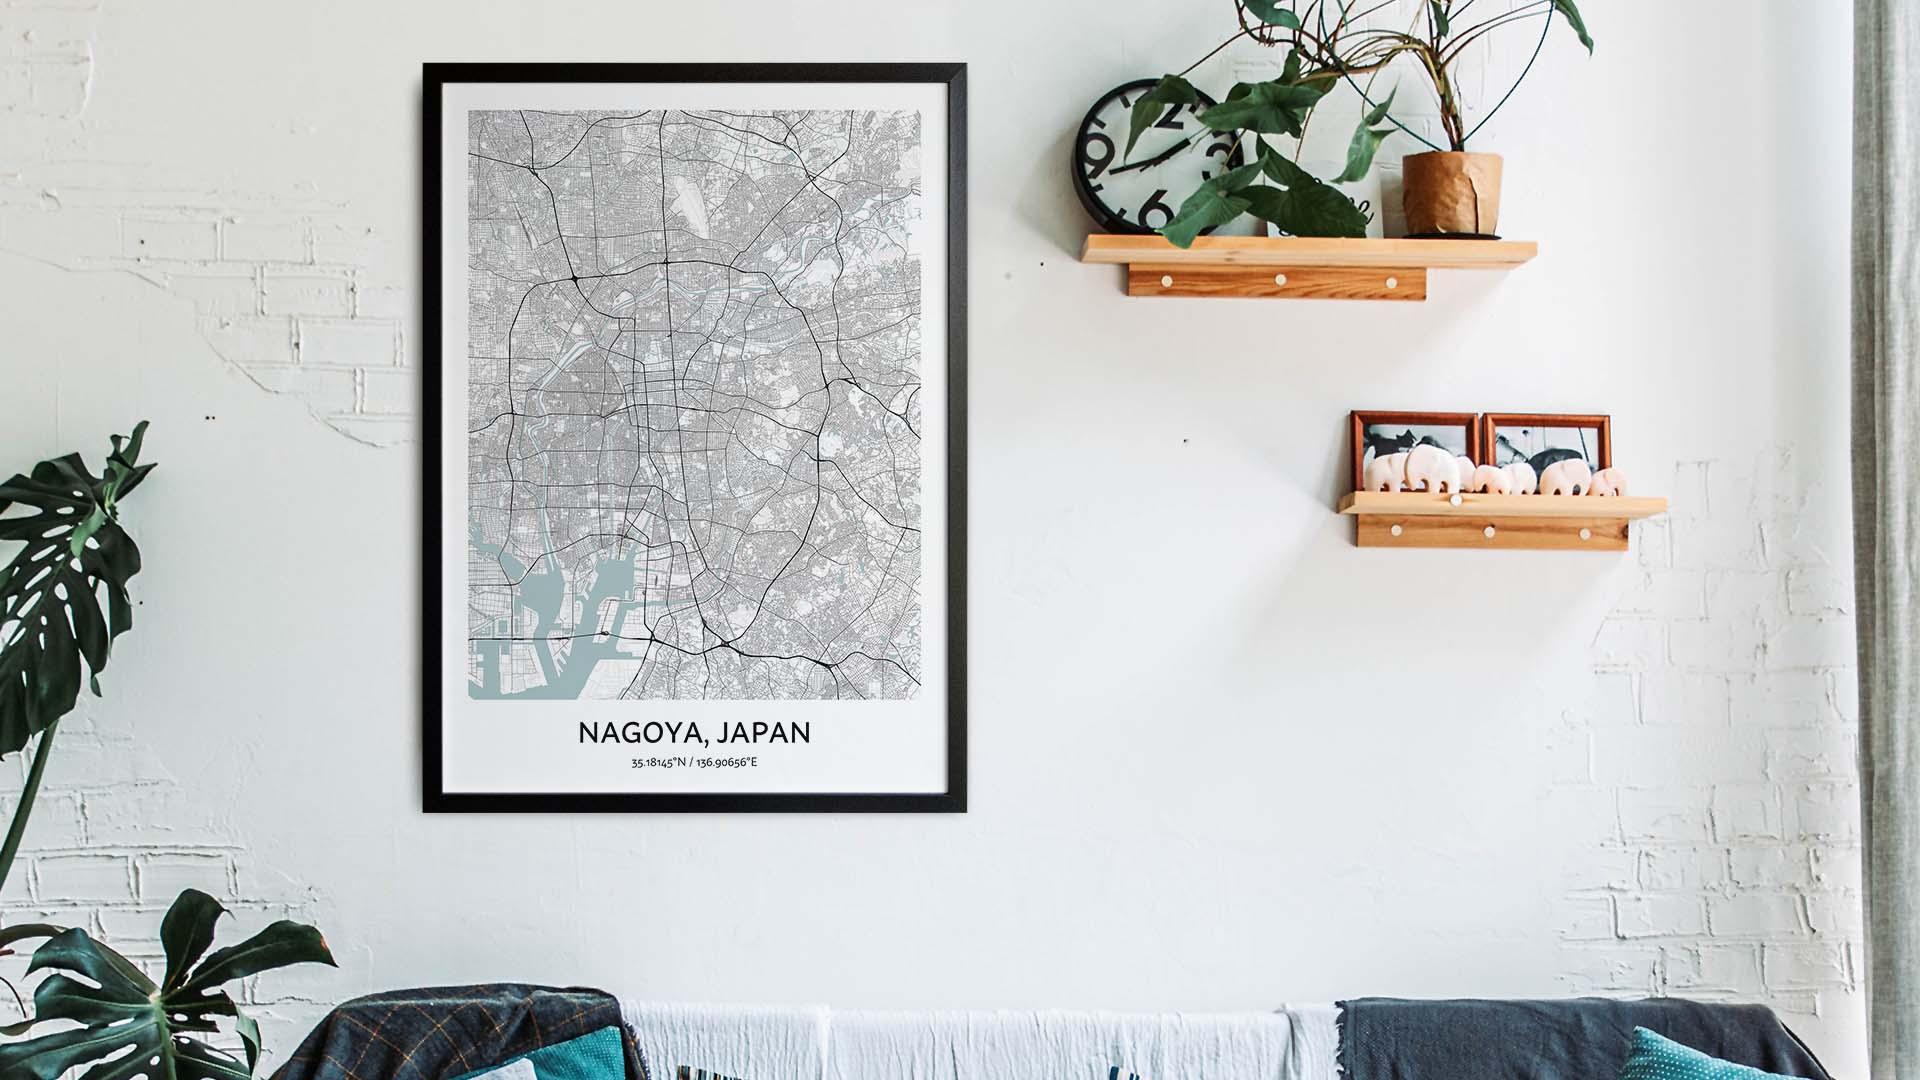 Nagoya map art